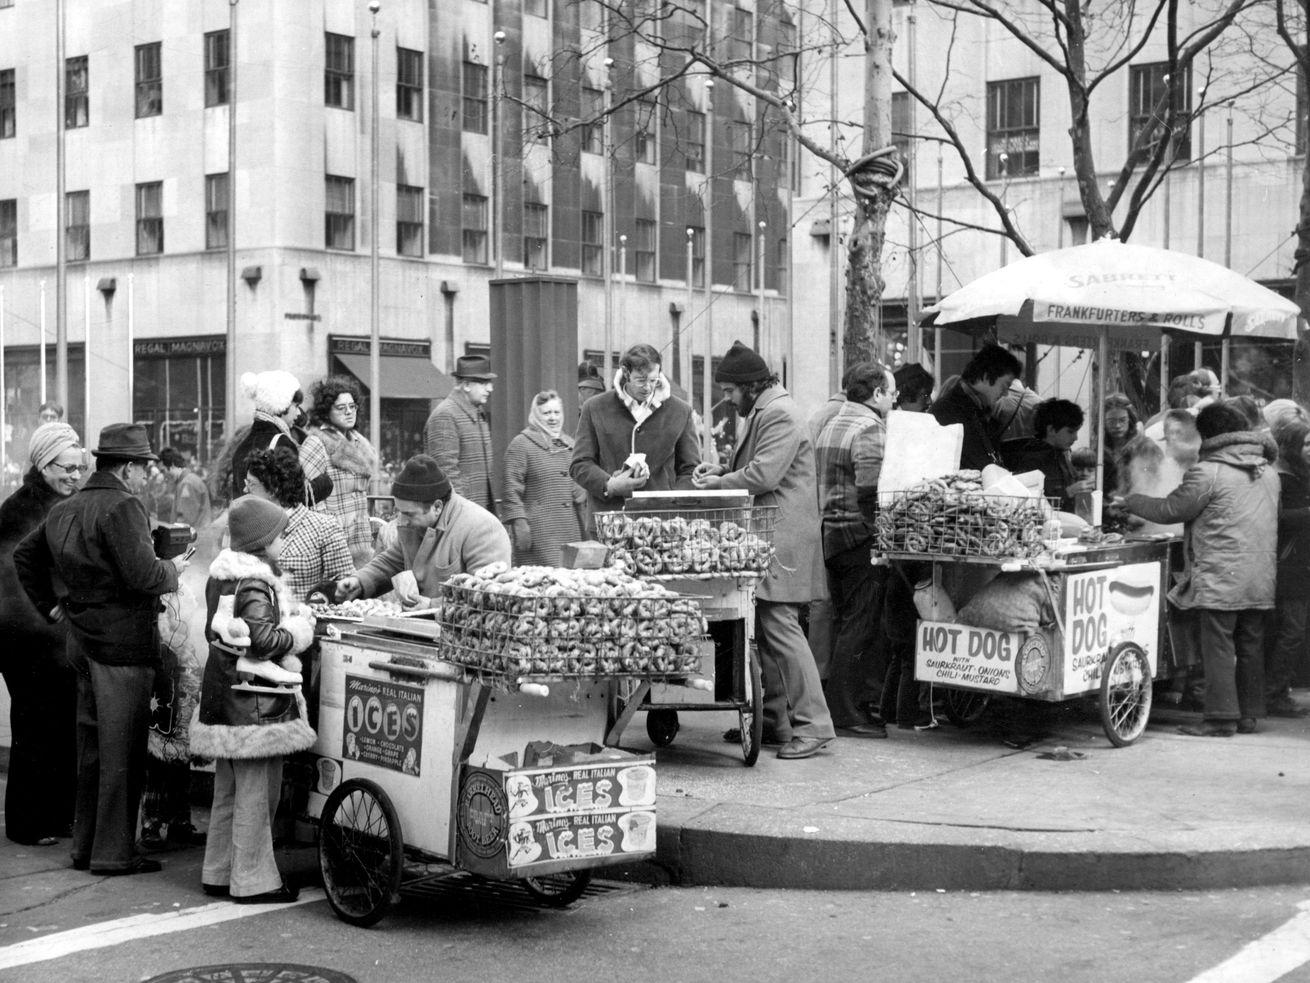 Old street vendors in New York City